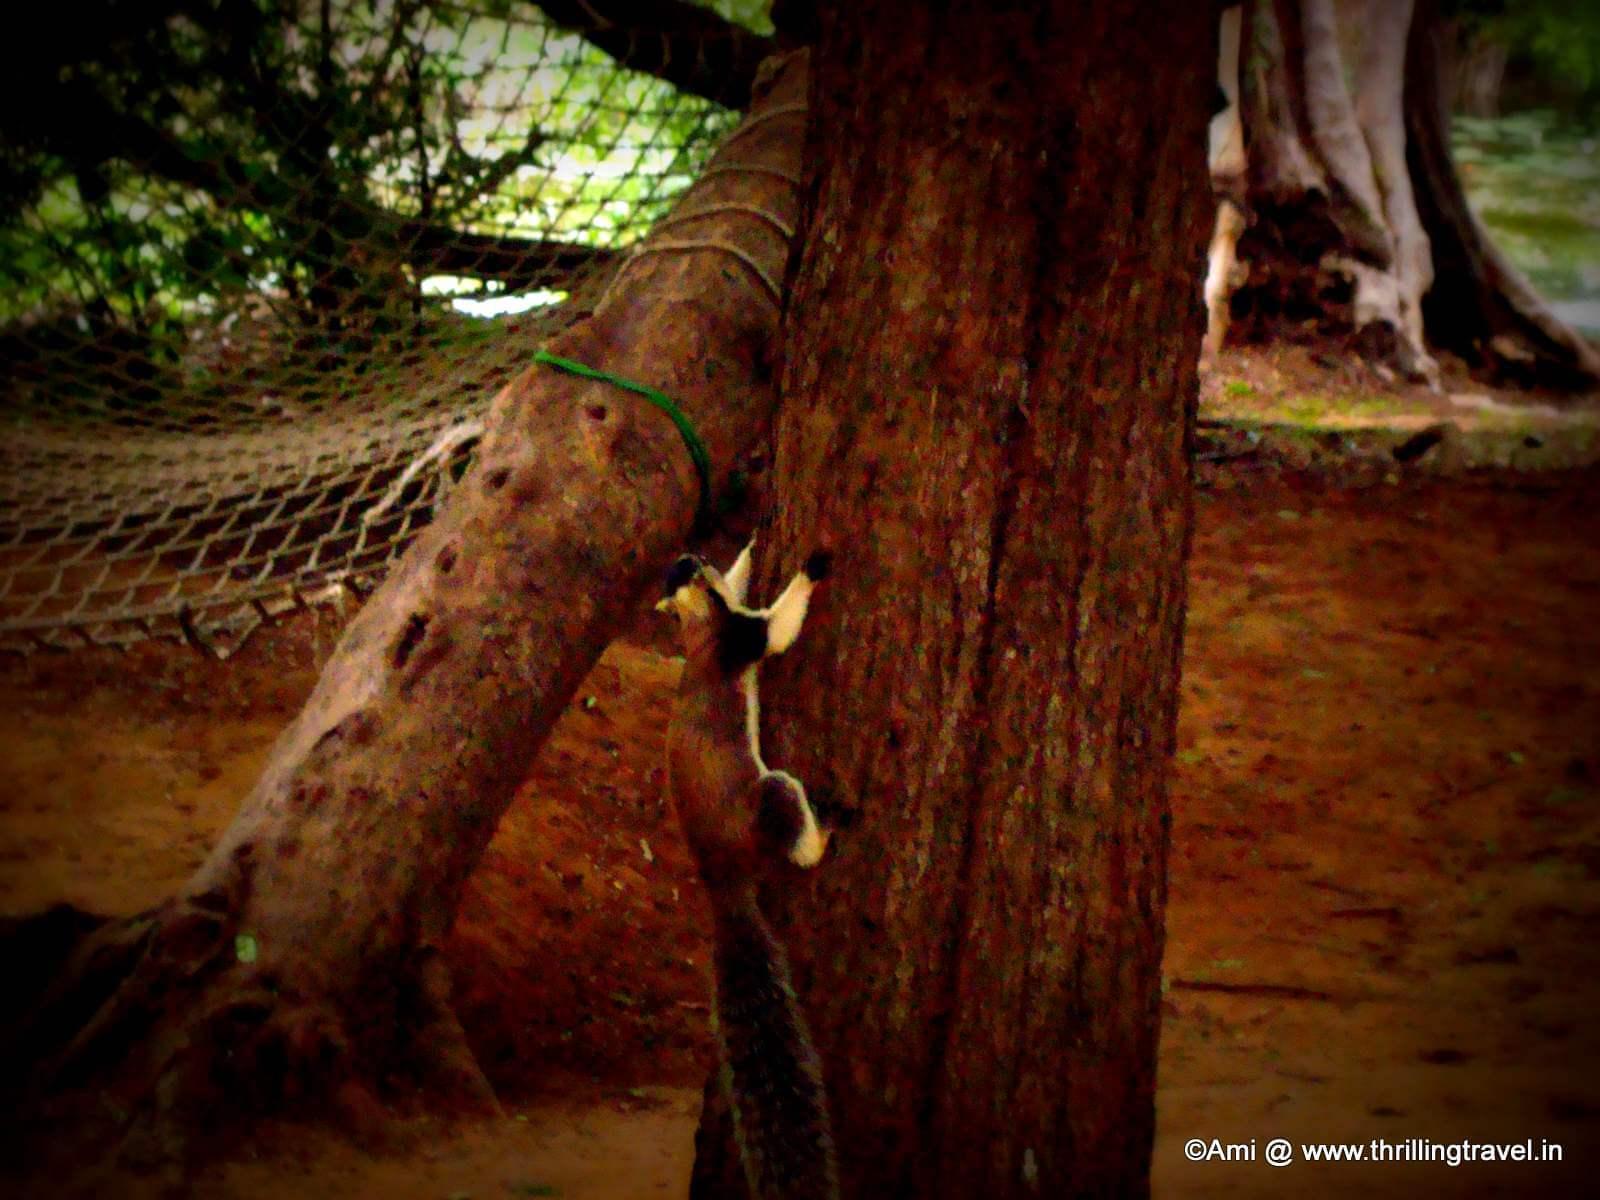 Giant Squirrel at the Bheemeshwari Fishing Camp